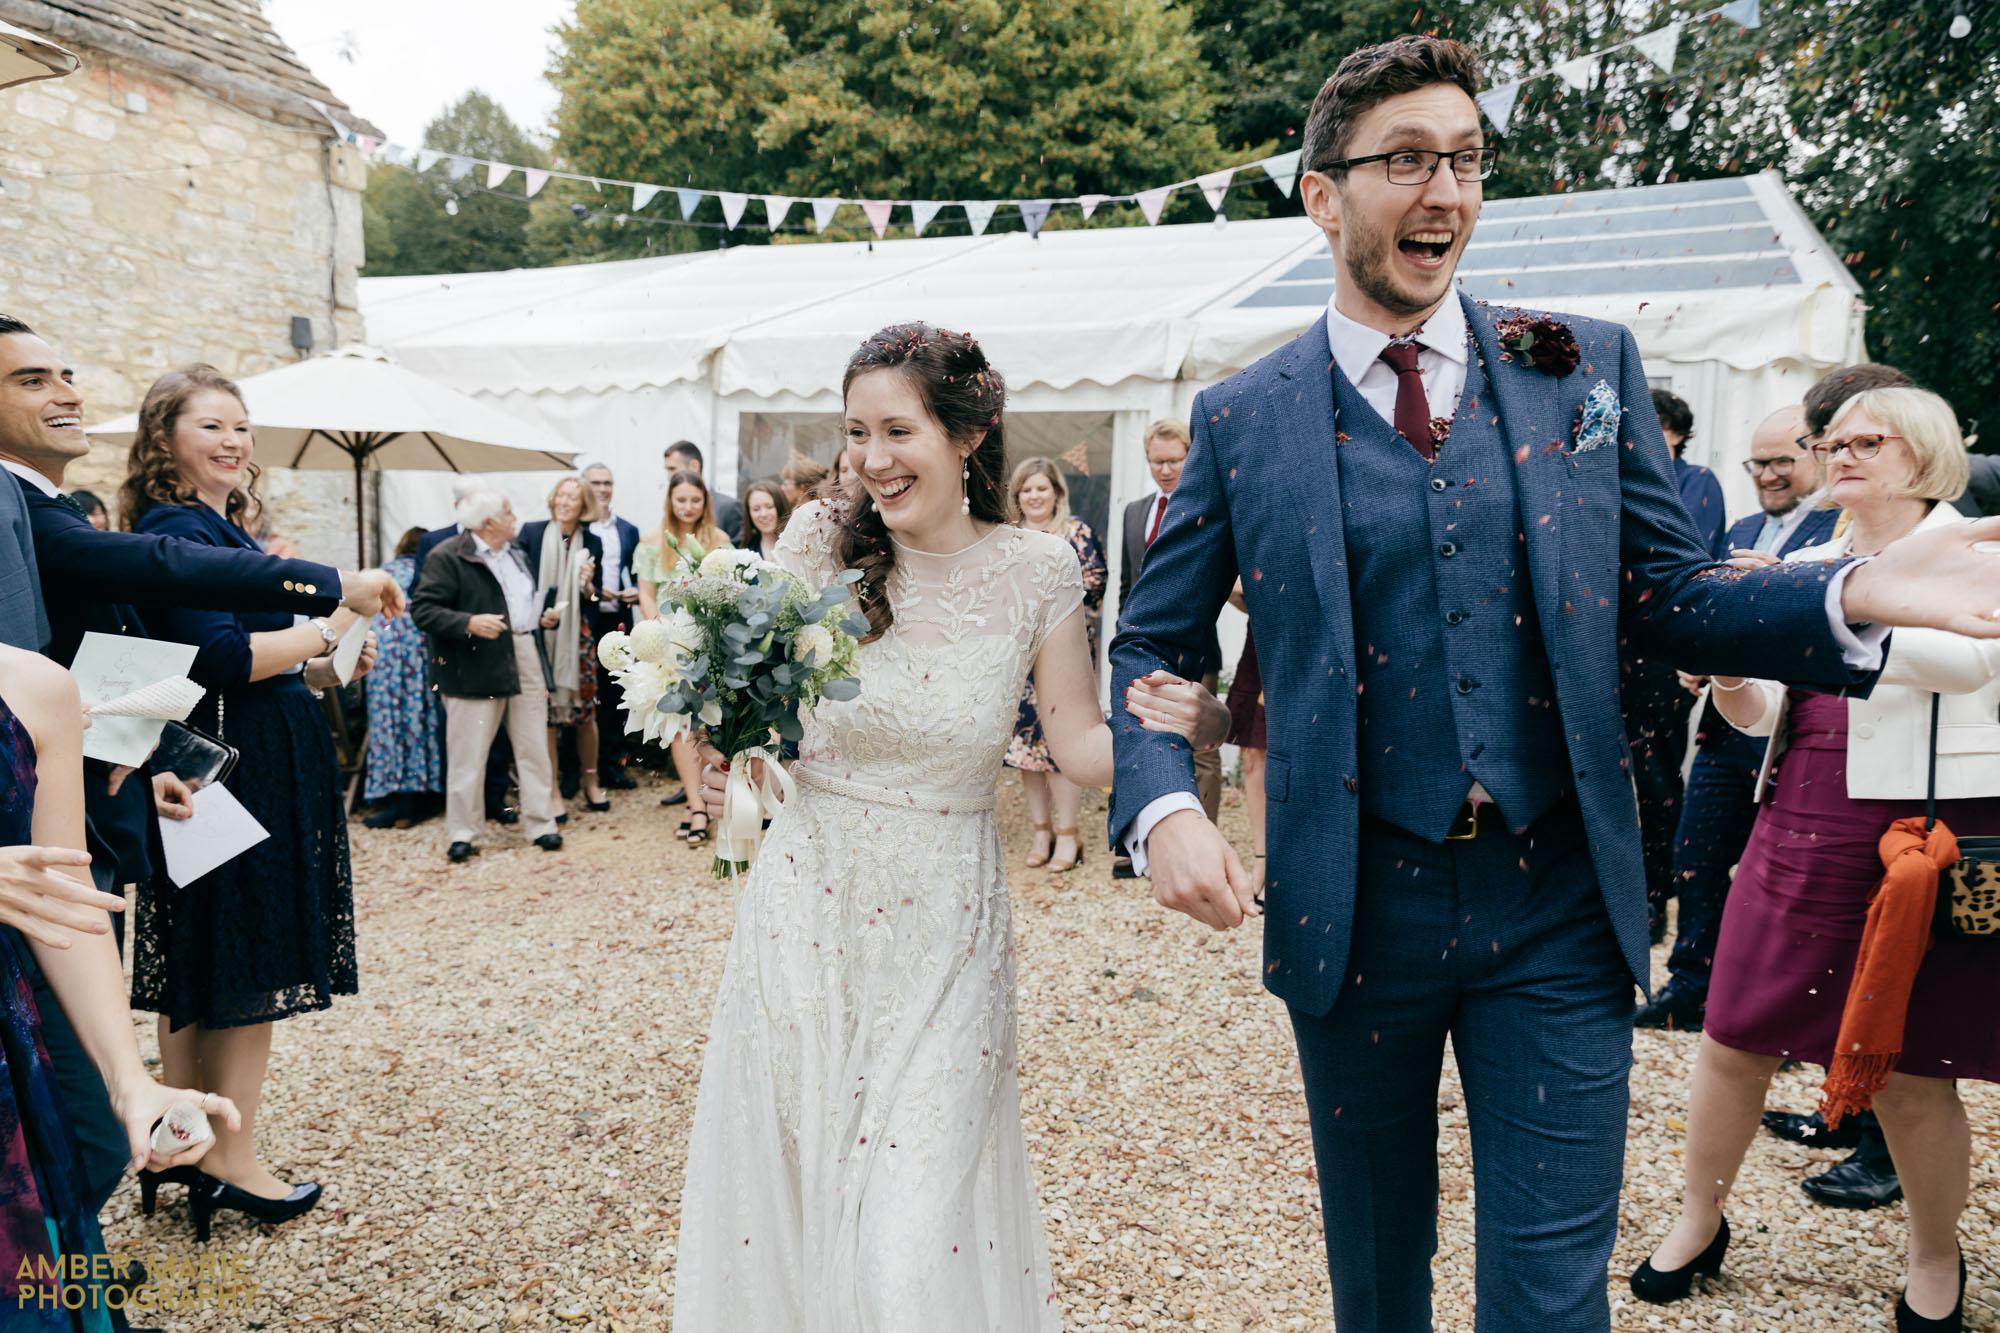 Owlpen Manor Wedding Photography by gloucestershire wedding photographer